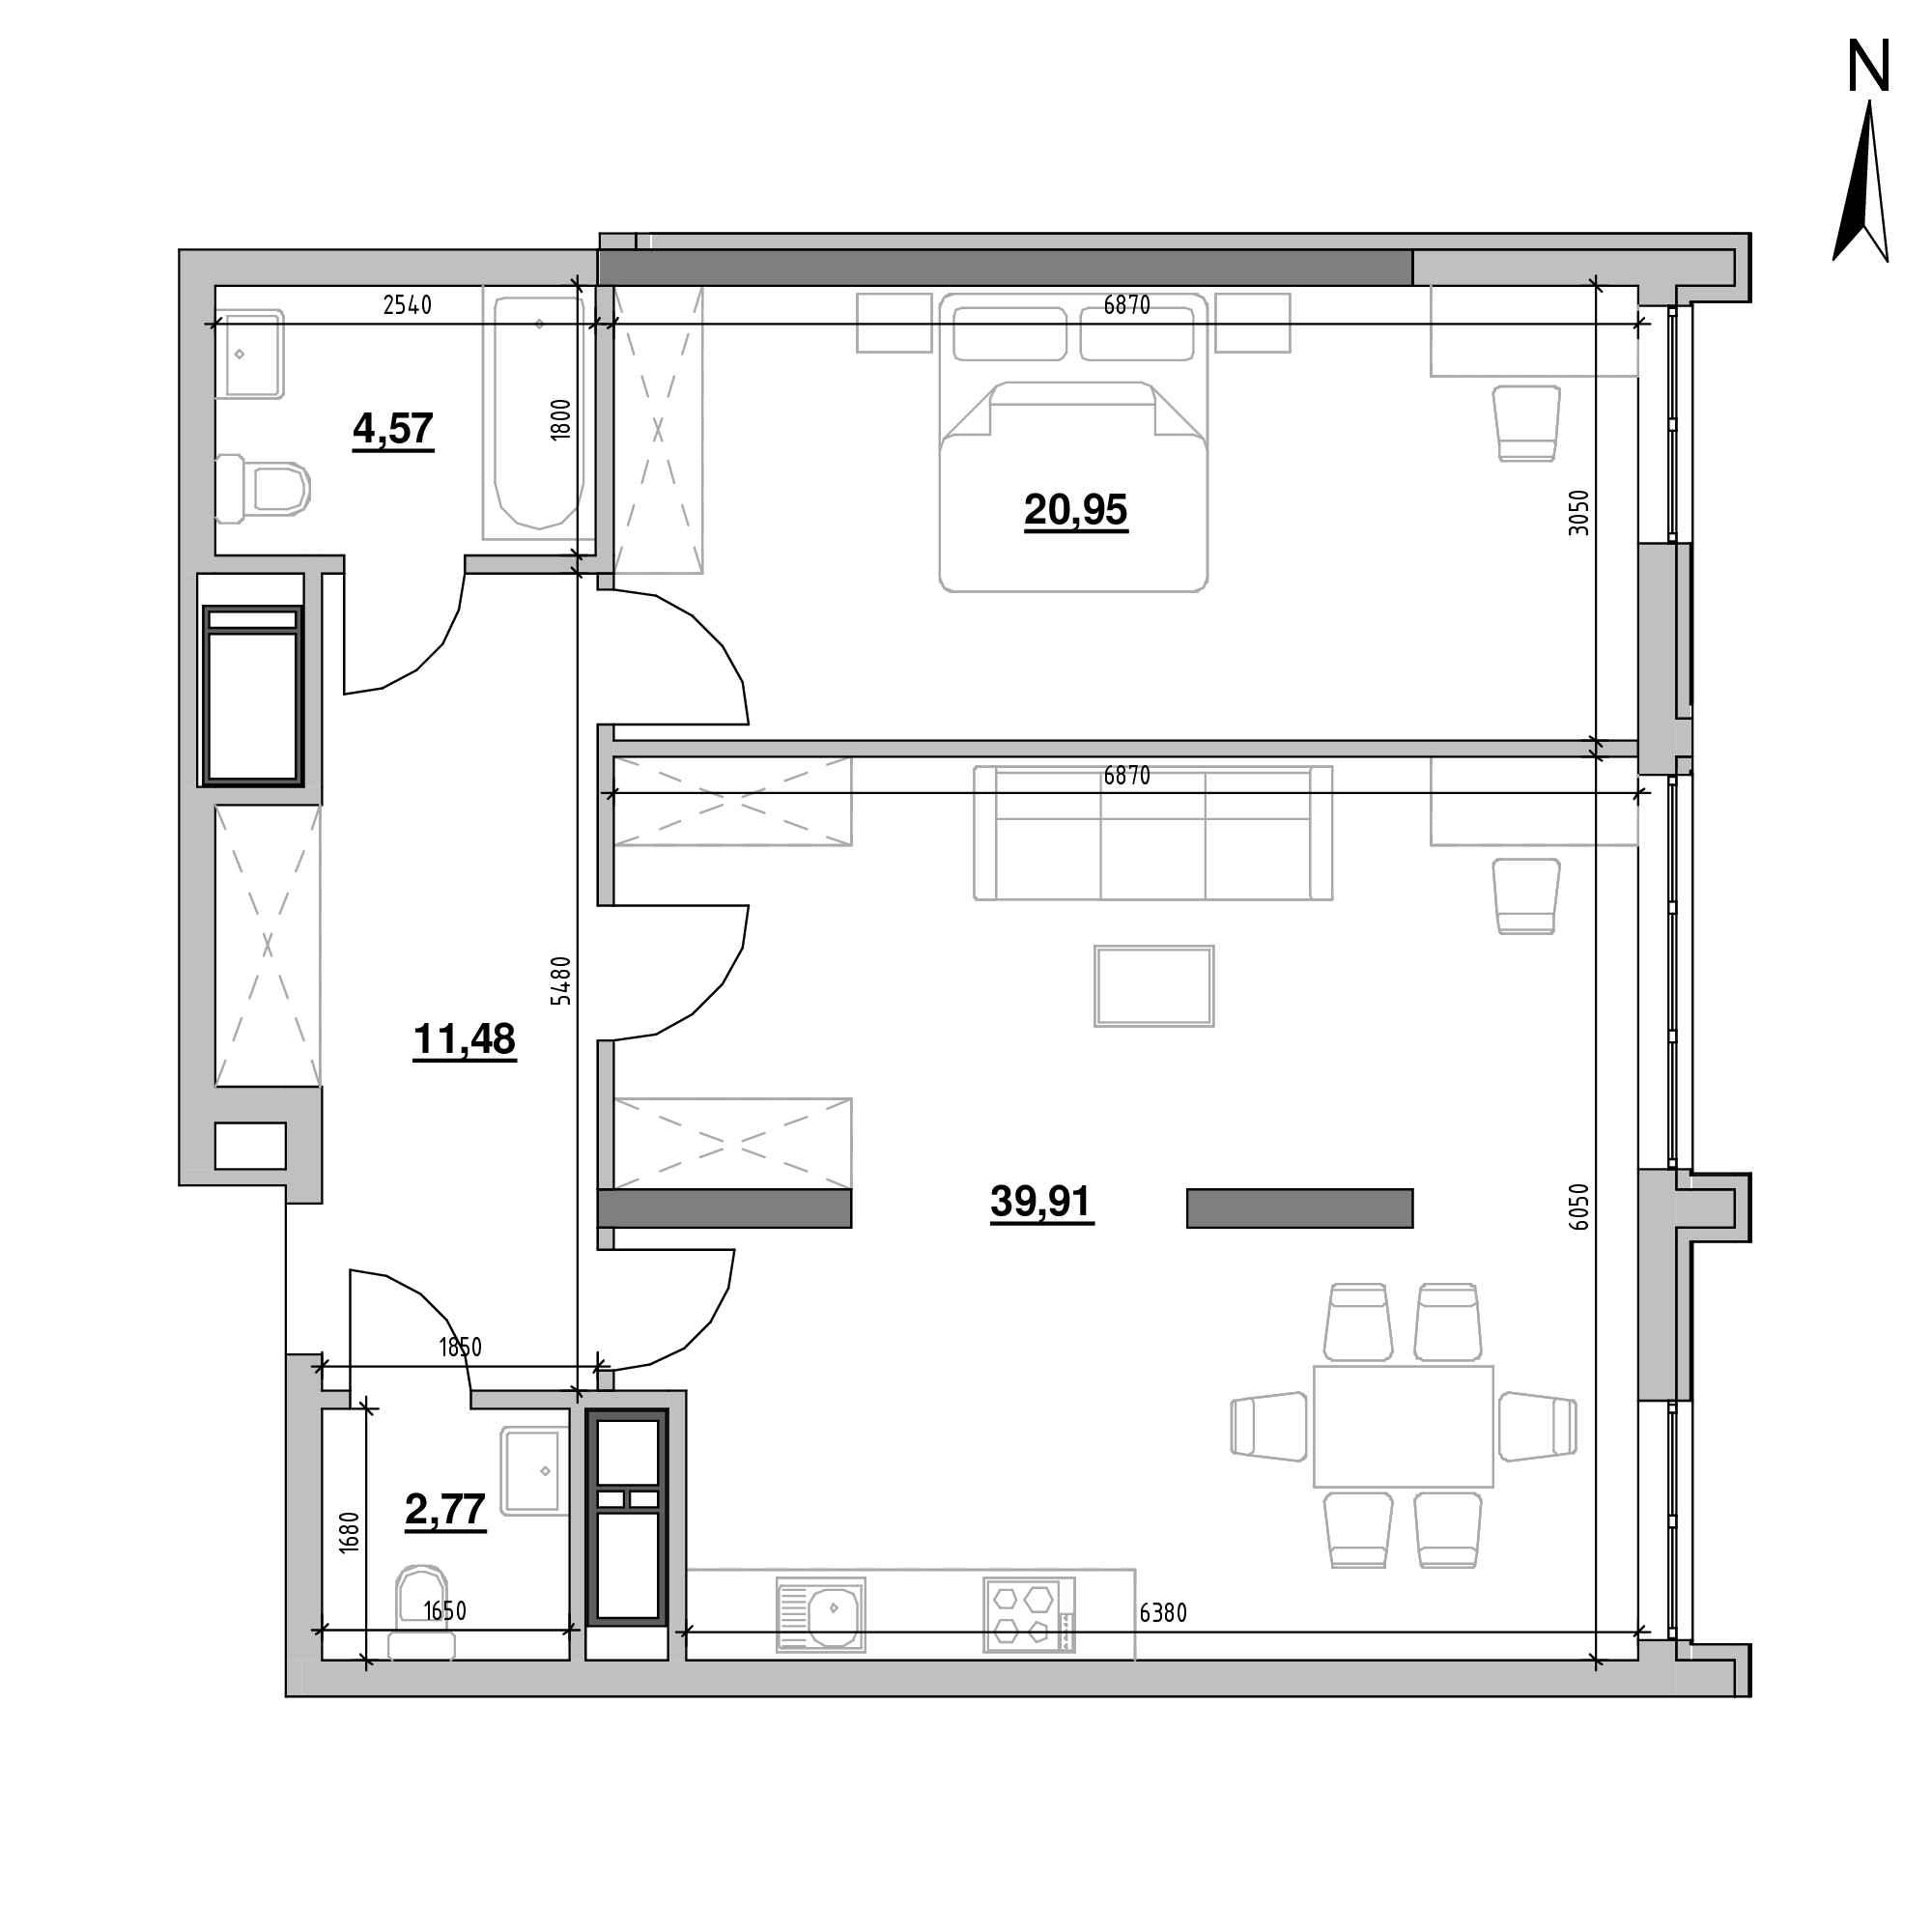 ЖК Nordica Residence: планування 1-кімнатної квартири, №206, 79.68 м<sup>2</sup>